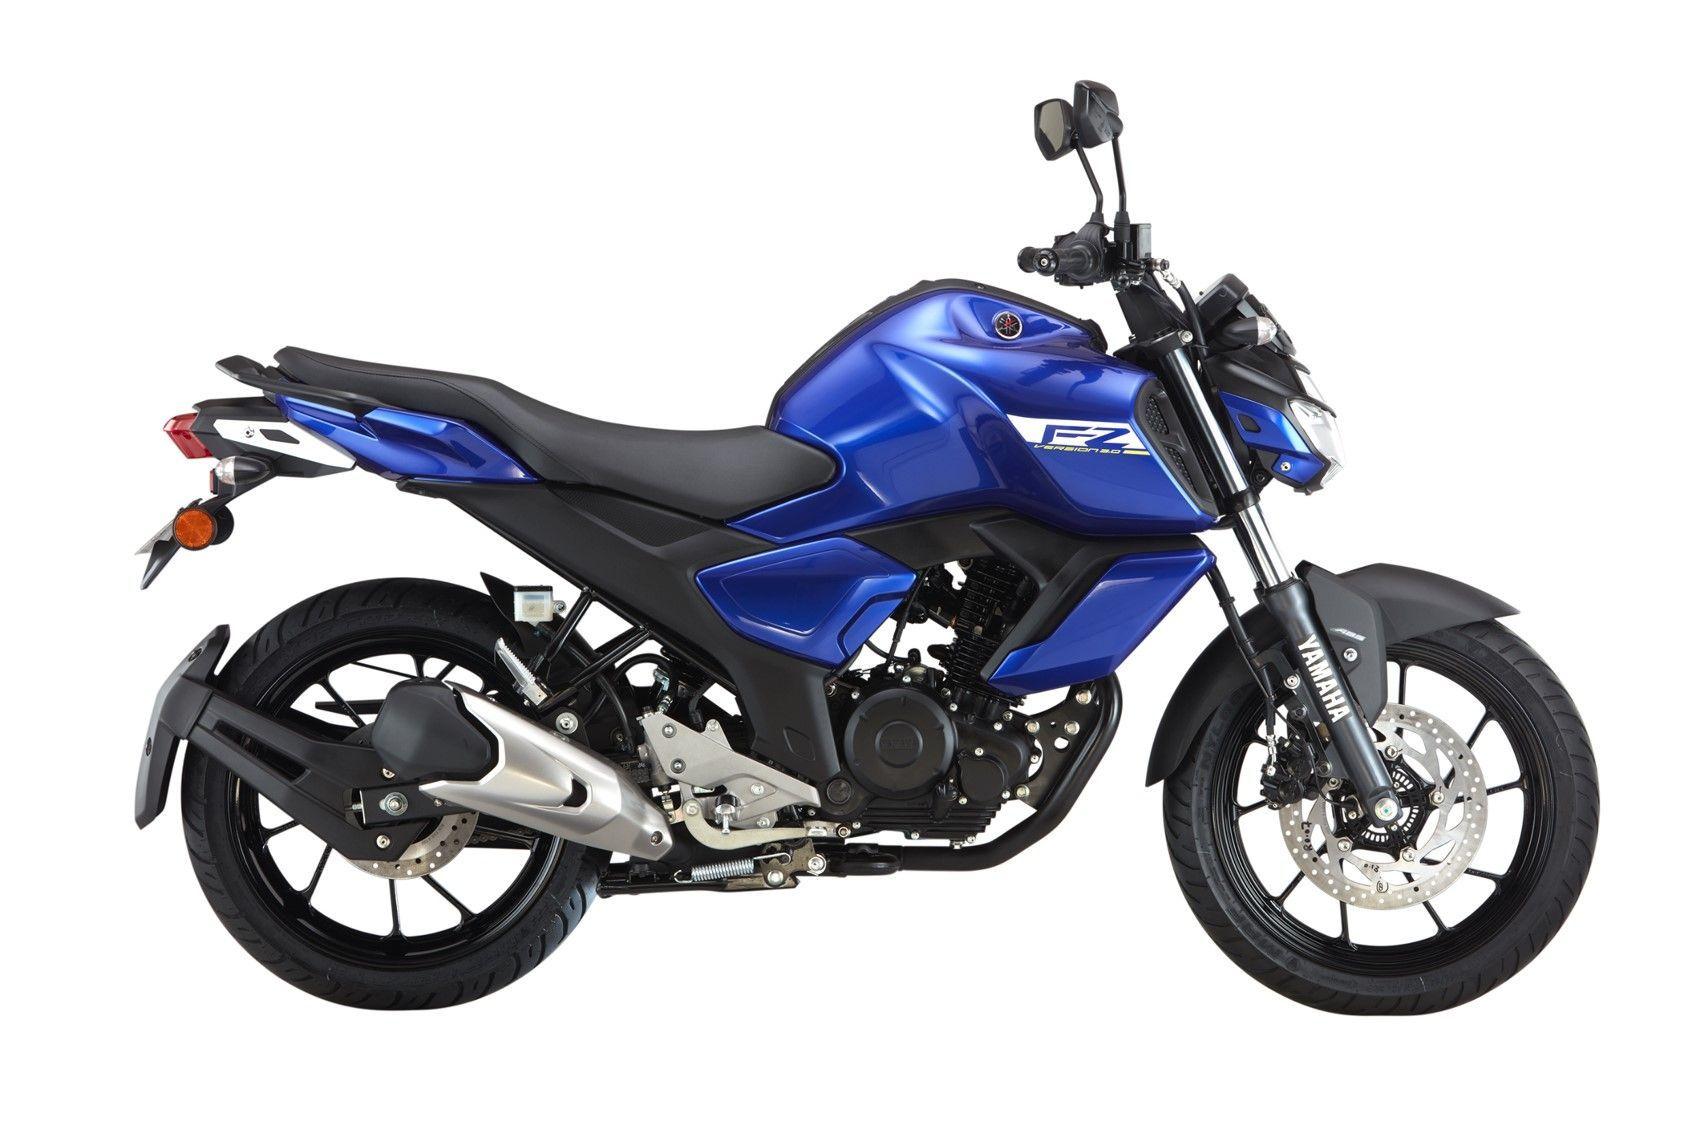 2019 Yamaha Fz V3 0 Colors Metric Black Racing Blue Fi Abs